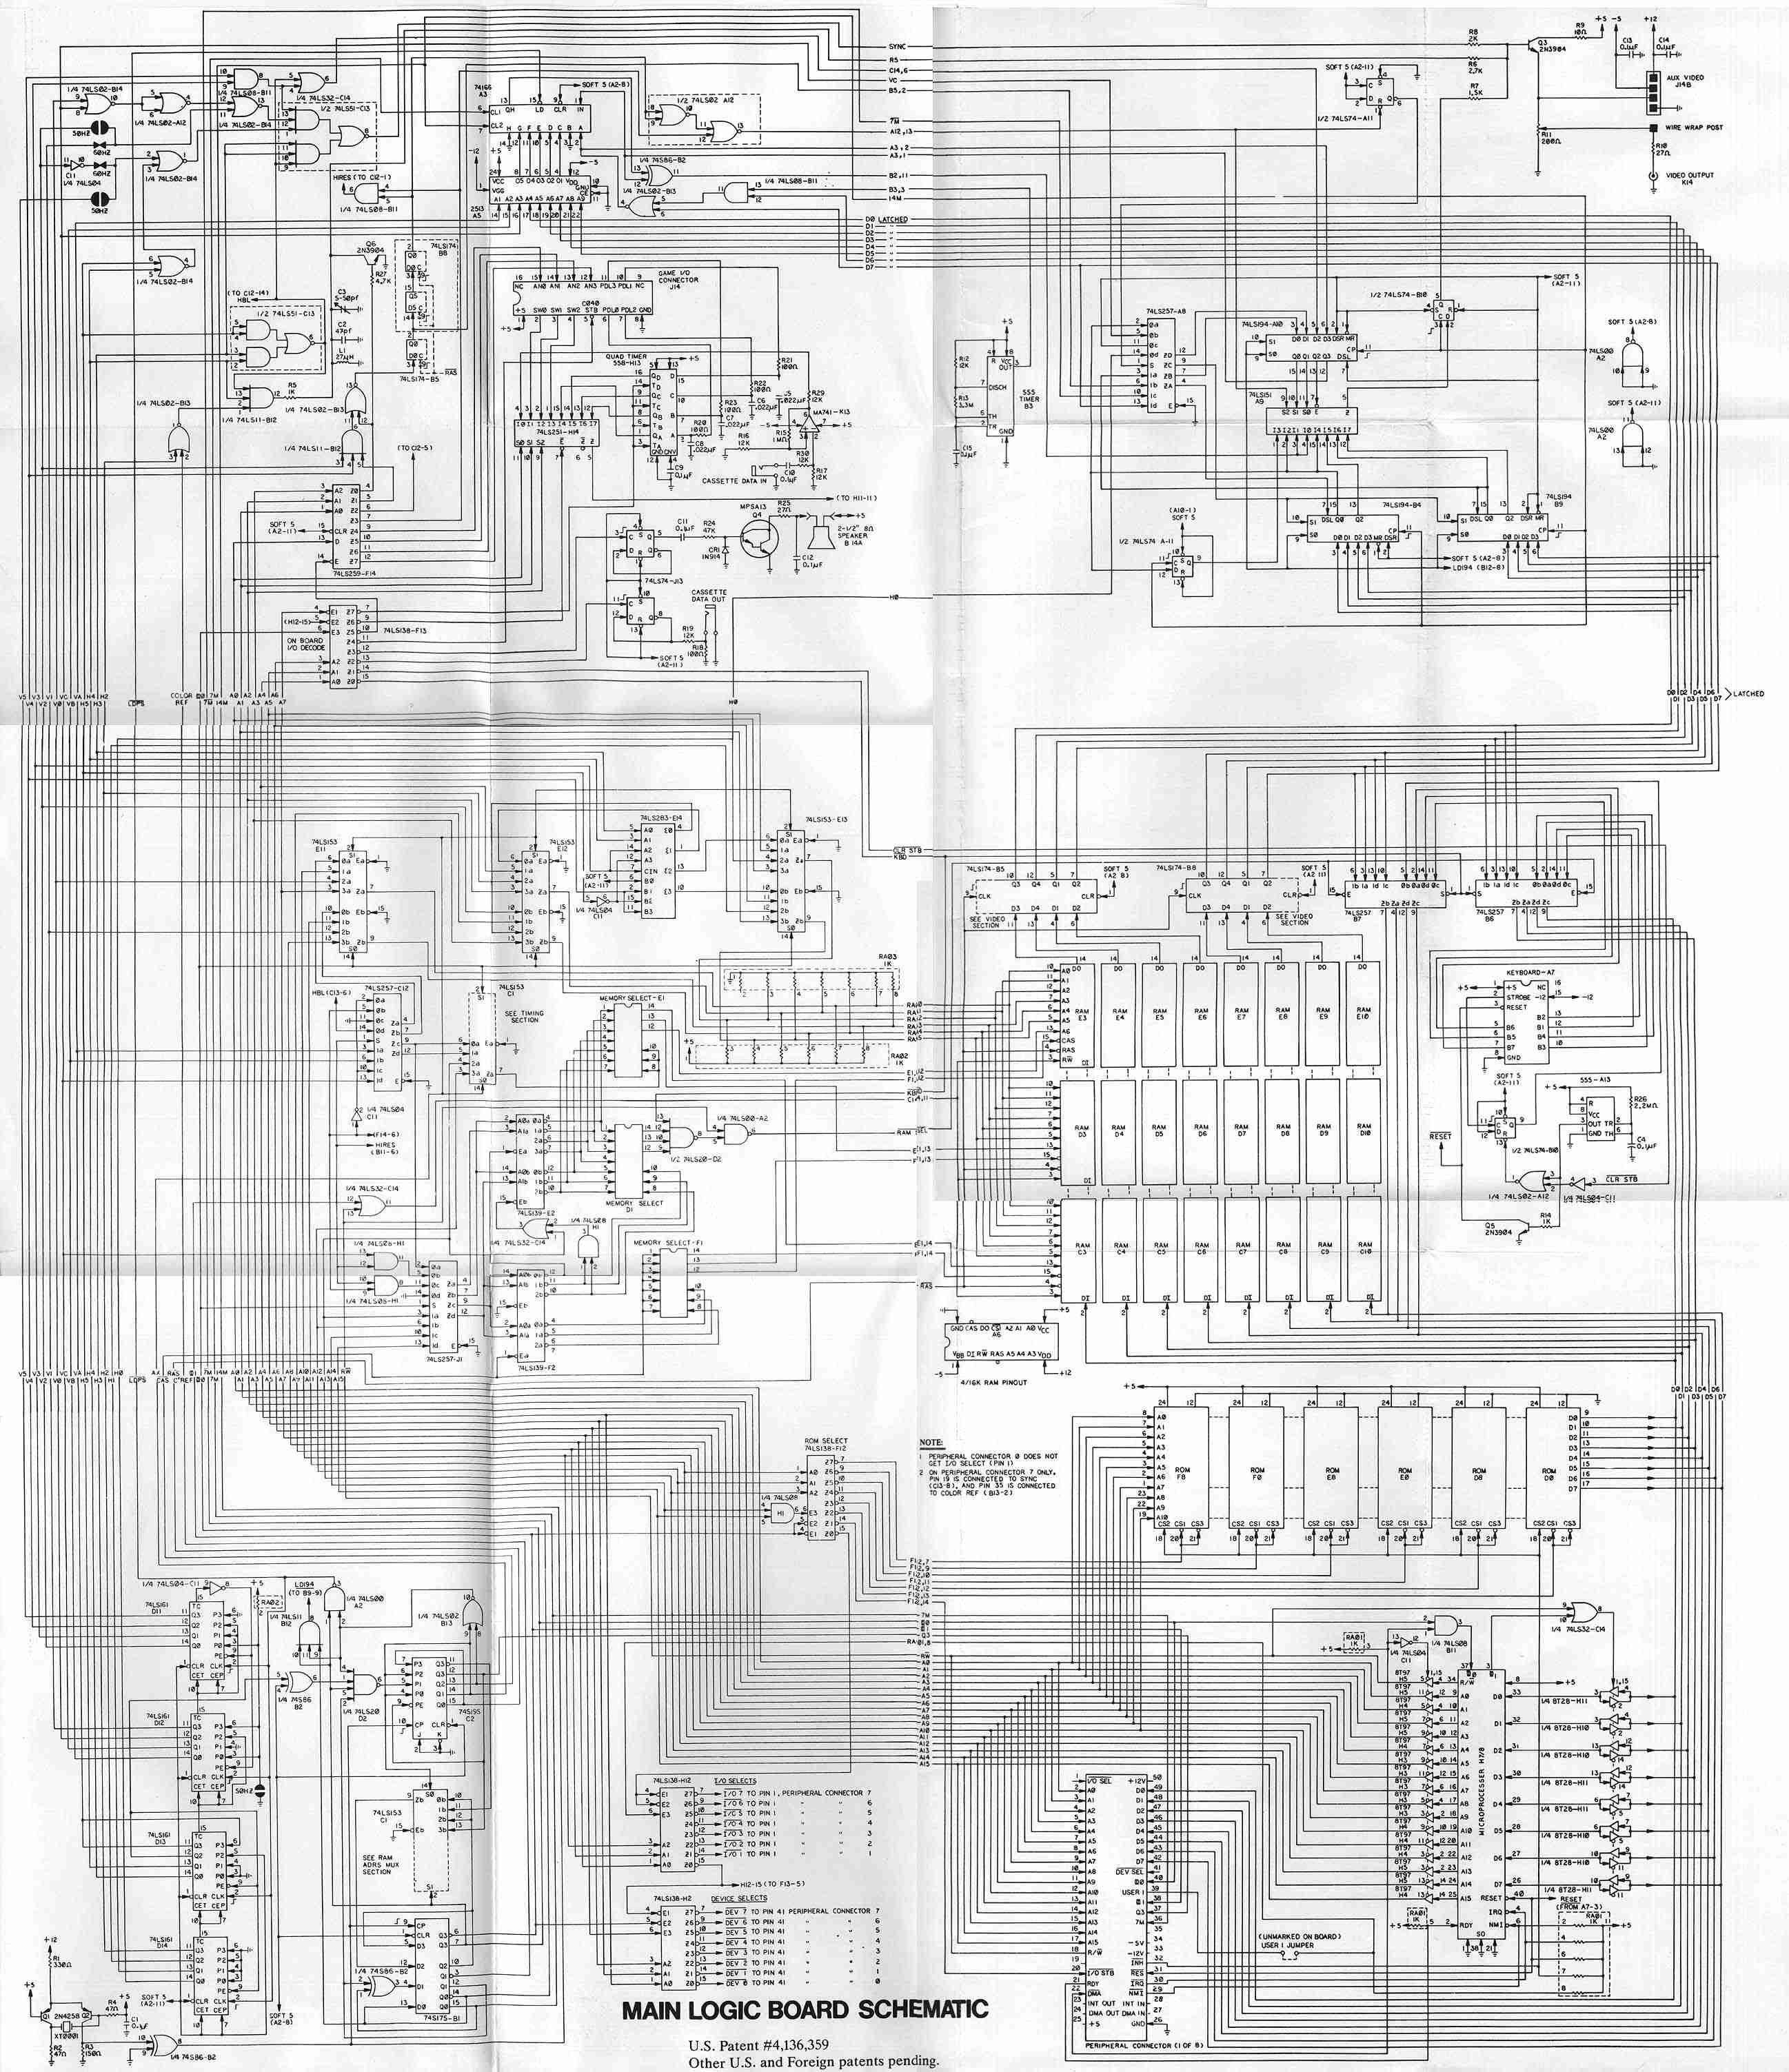 Apple 2 Main Logic Board Electronic Circuit Schematic